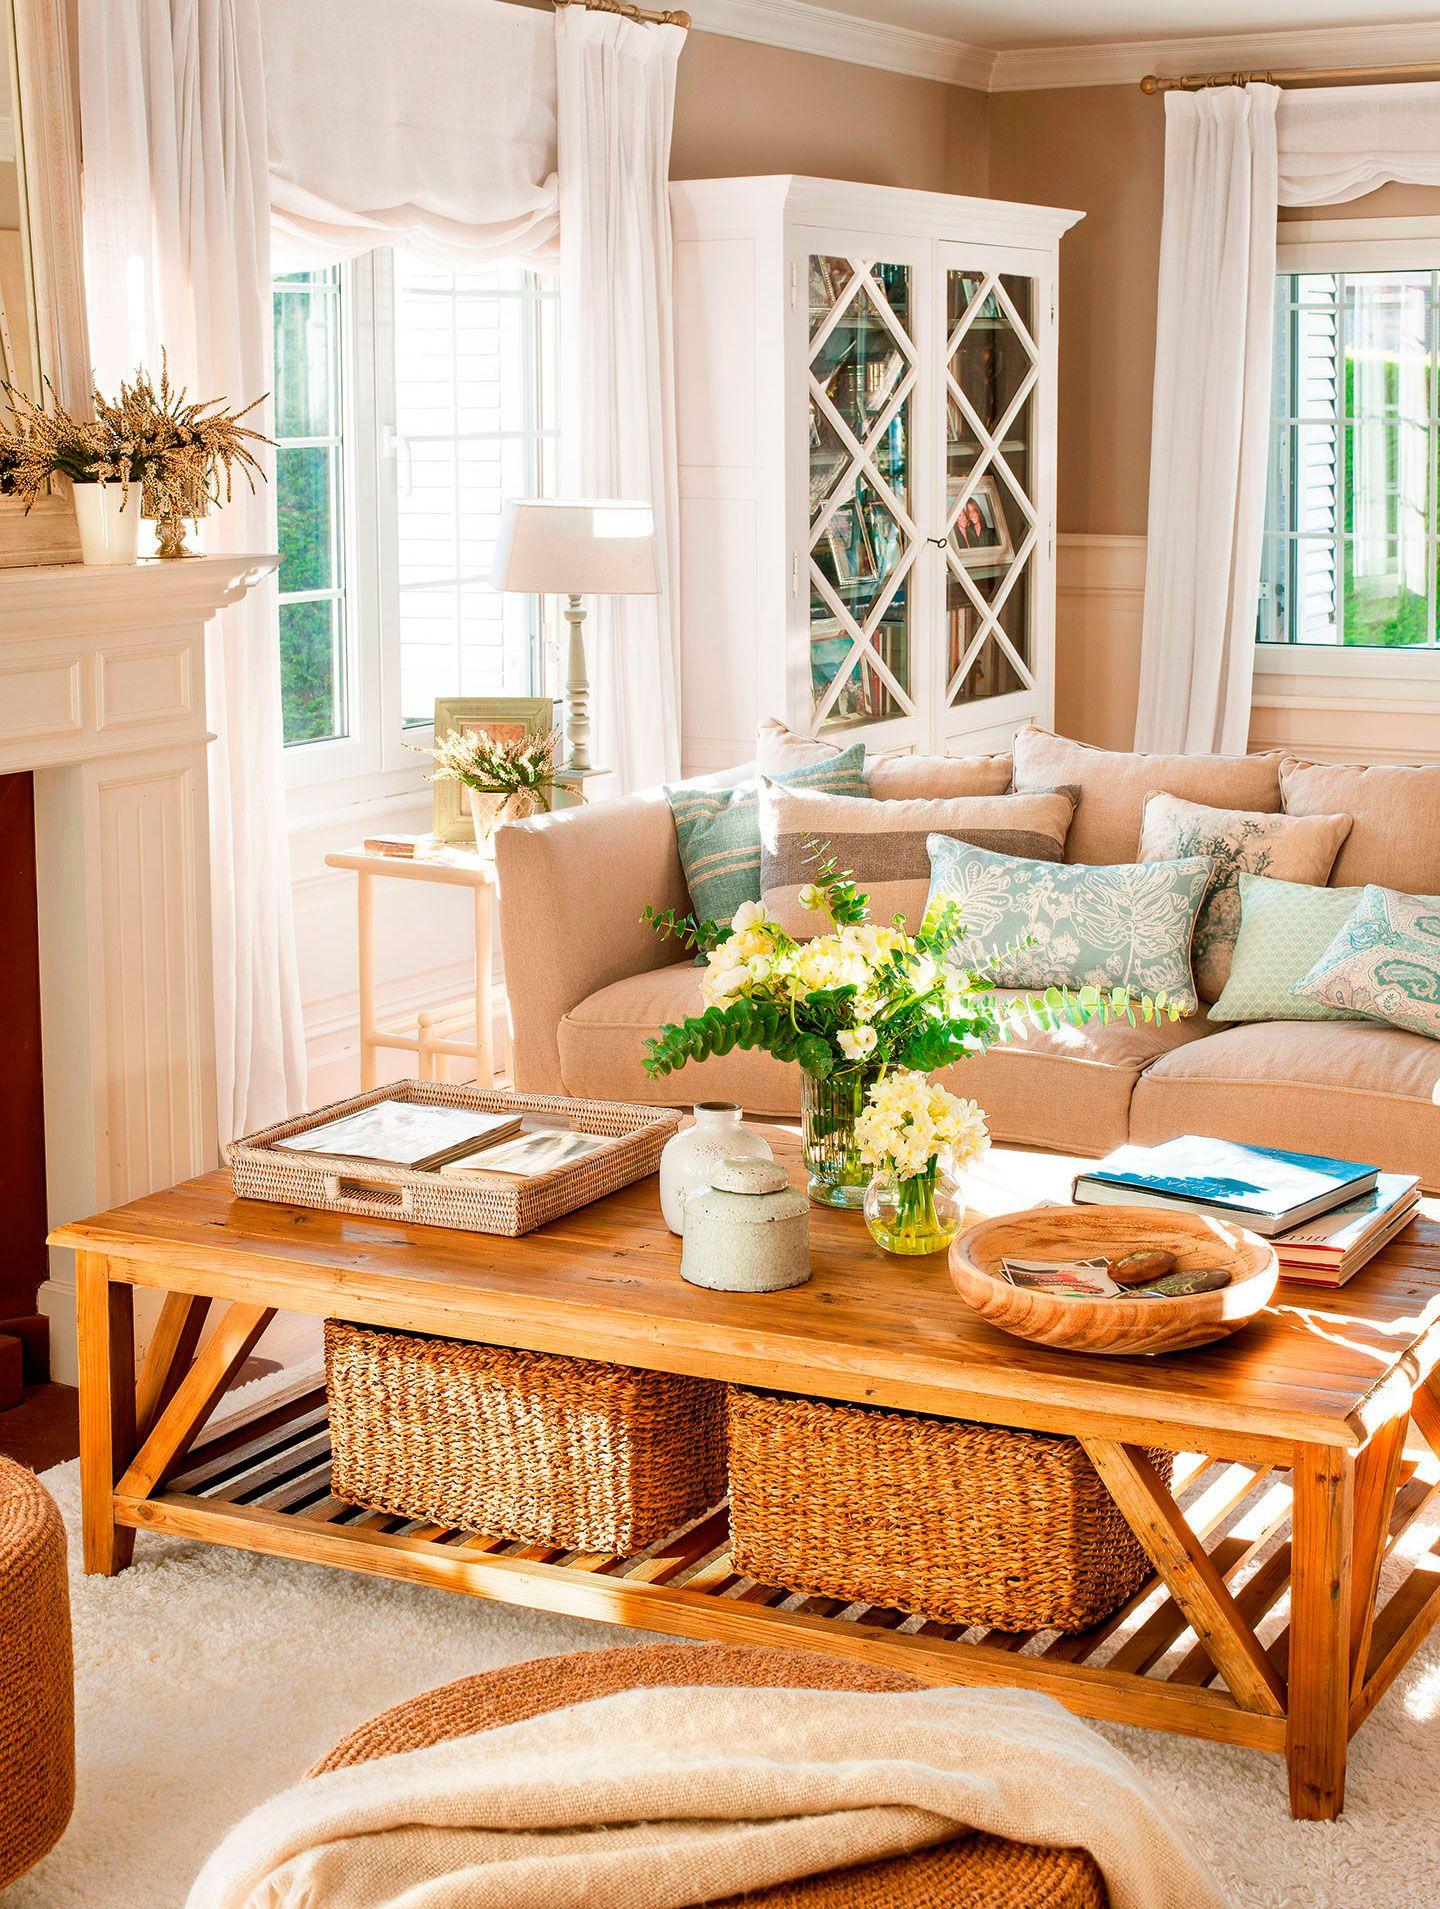 saln con mesa de centro de madera sof gris vitrina blanca y cestas de